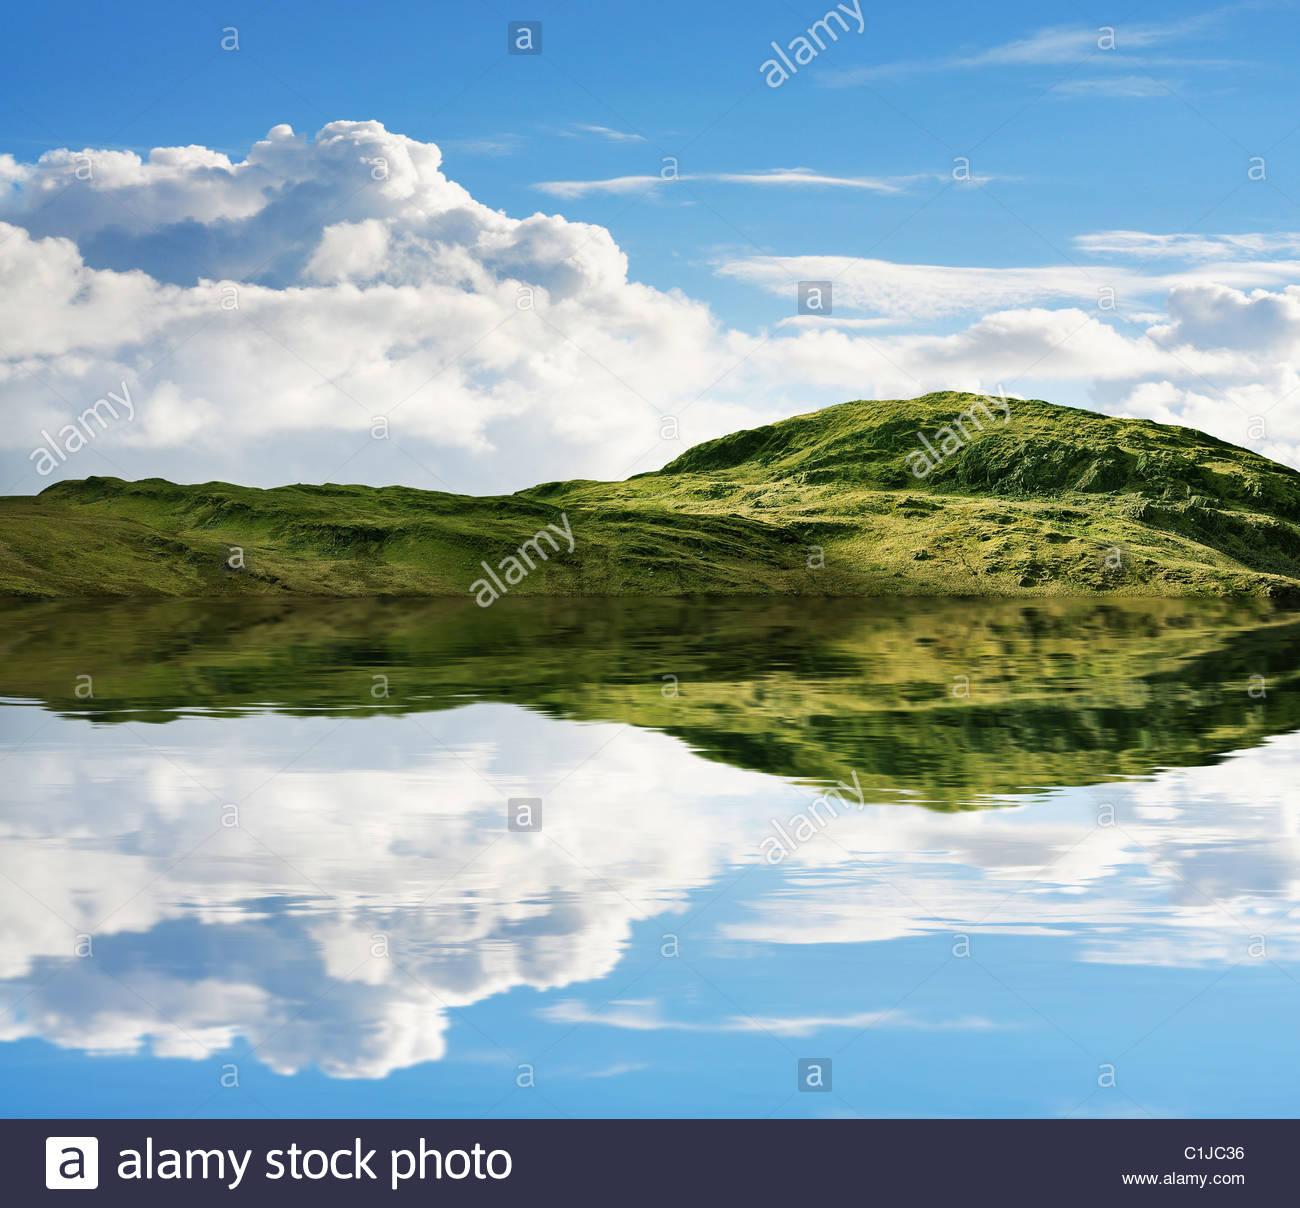 Abrupto cerro lago Imagen De Stock